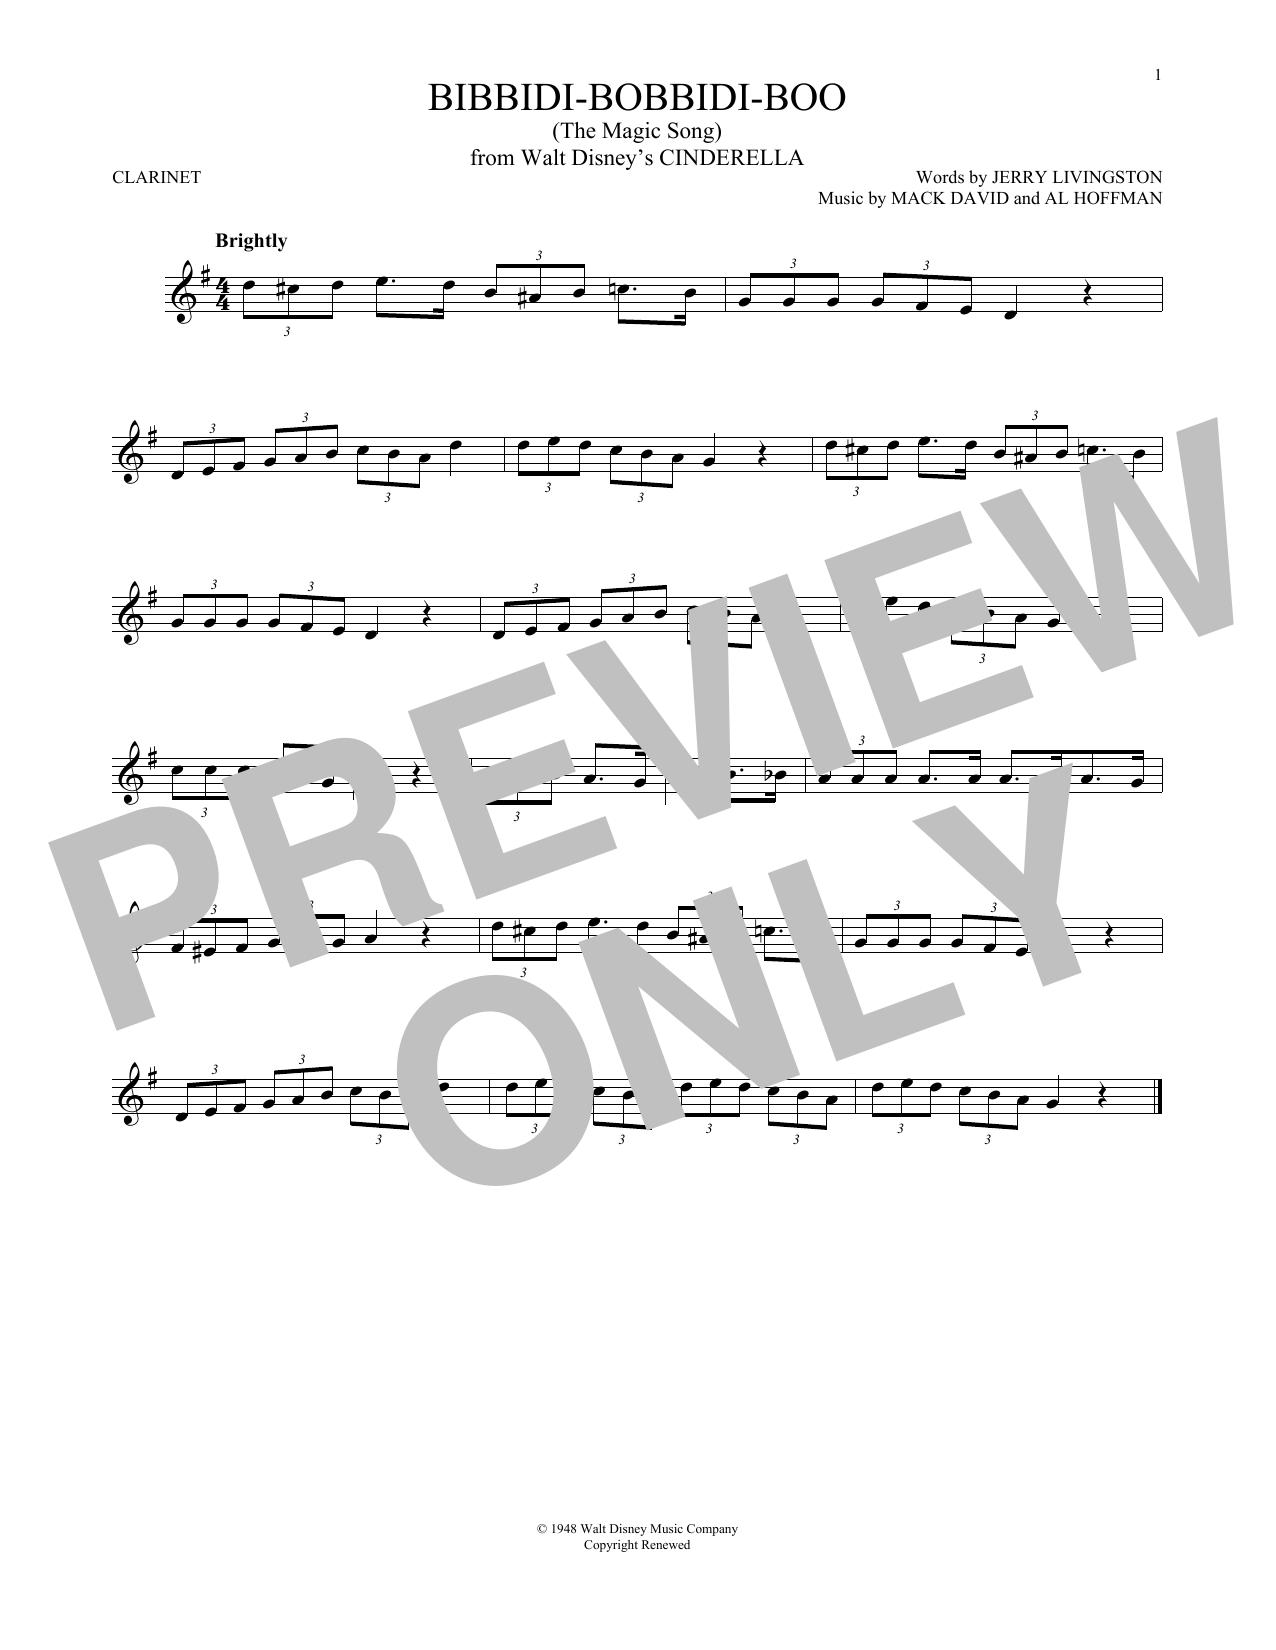 Bibbidi-Bobbidi-Boo (The Magic Song) (Clarinet Solo)